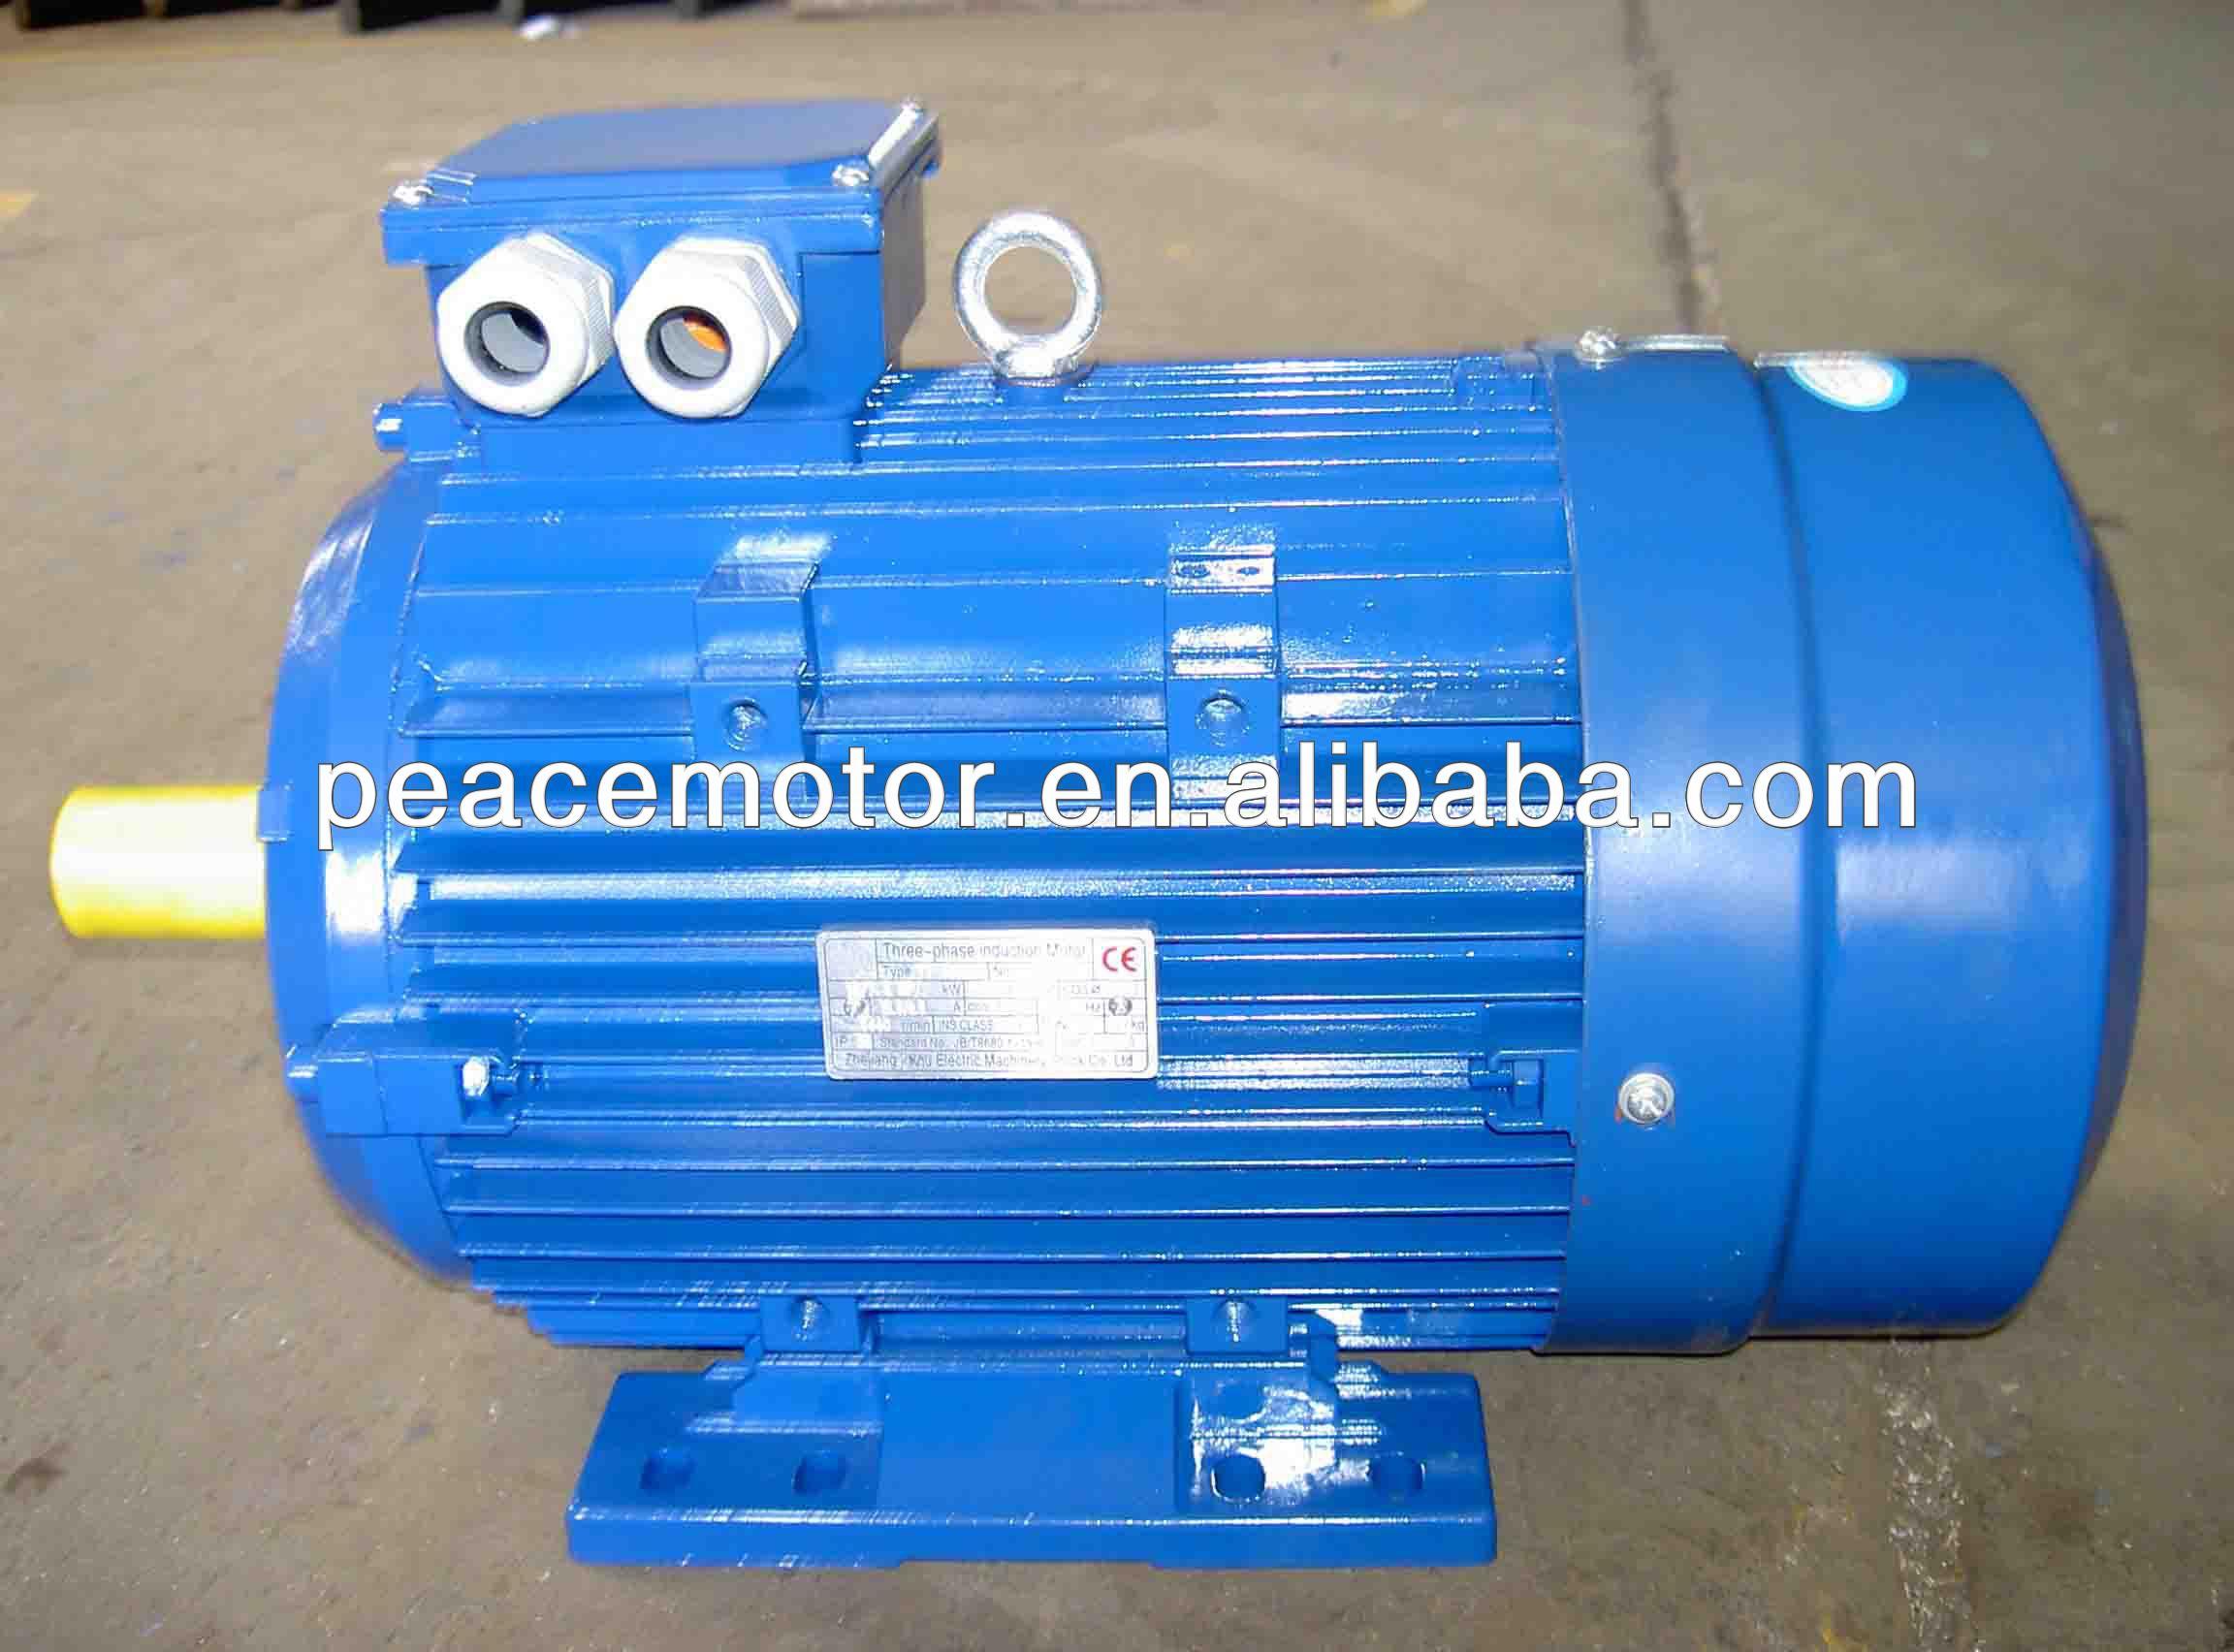 Brushless dc electric motor 48v 1500w buy brushless dc for Brushless dc electric motors